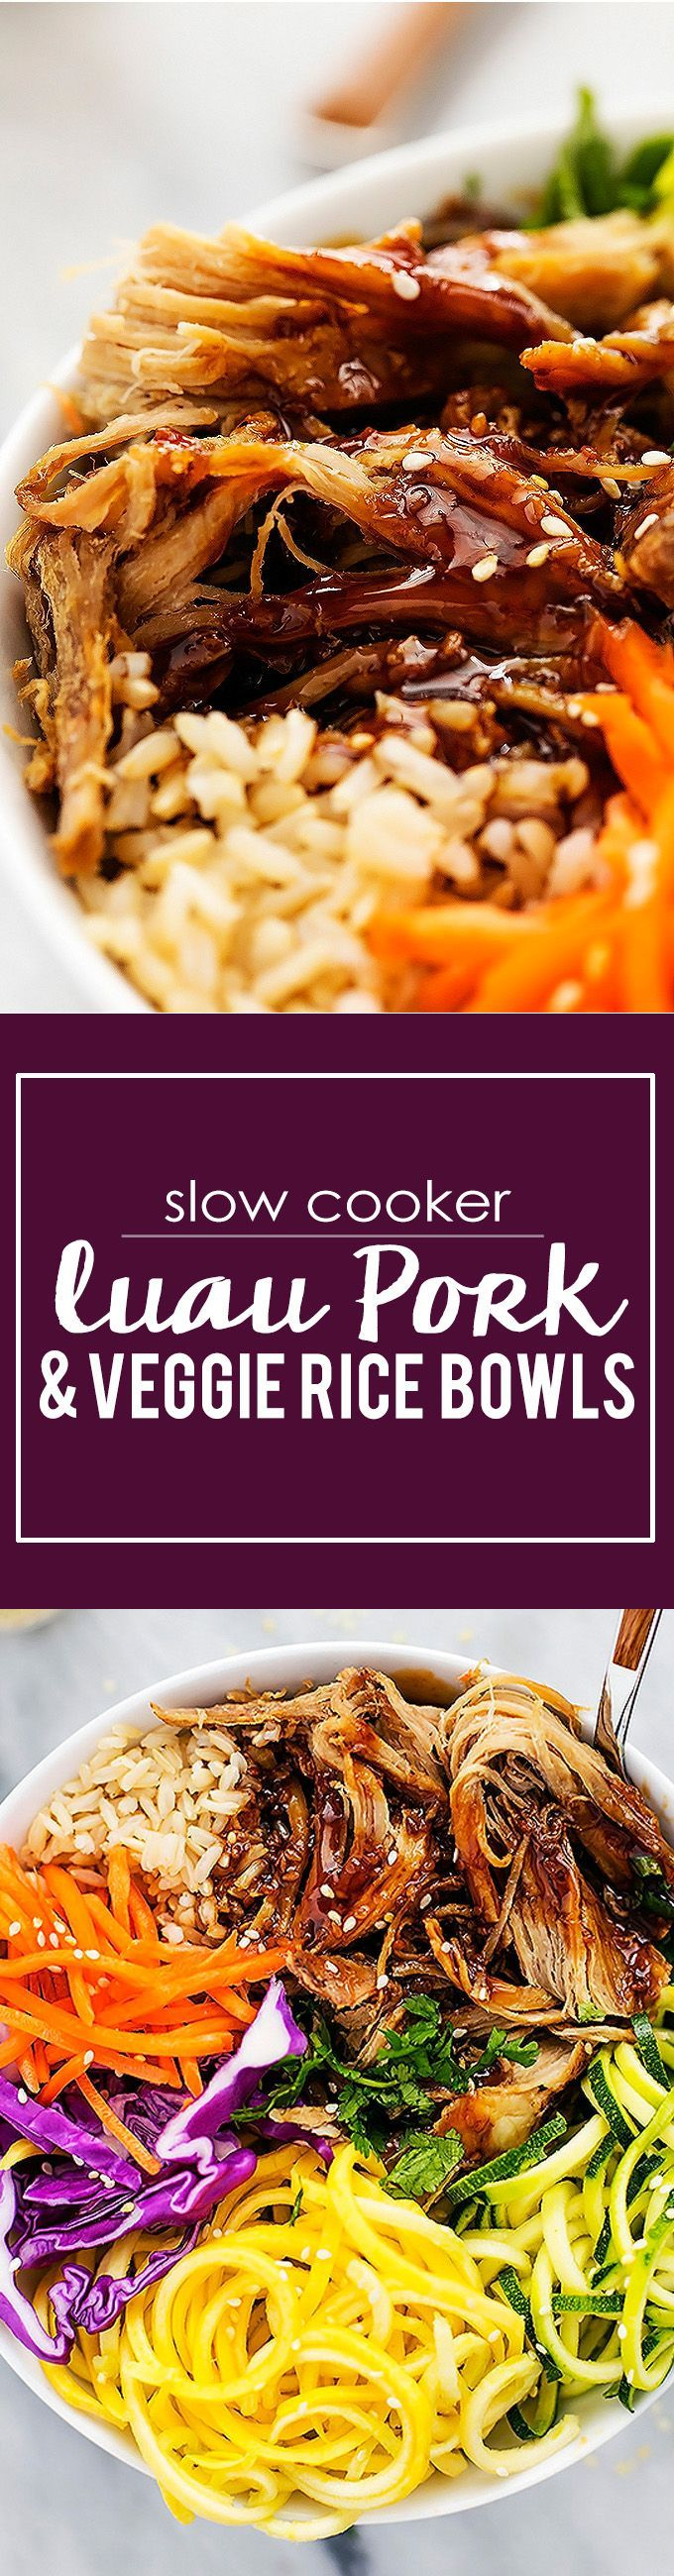 Luau Pork + Rainbow Veggie Rice Bowls | Creme de la Crumb